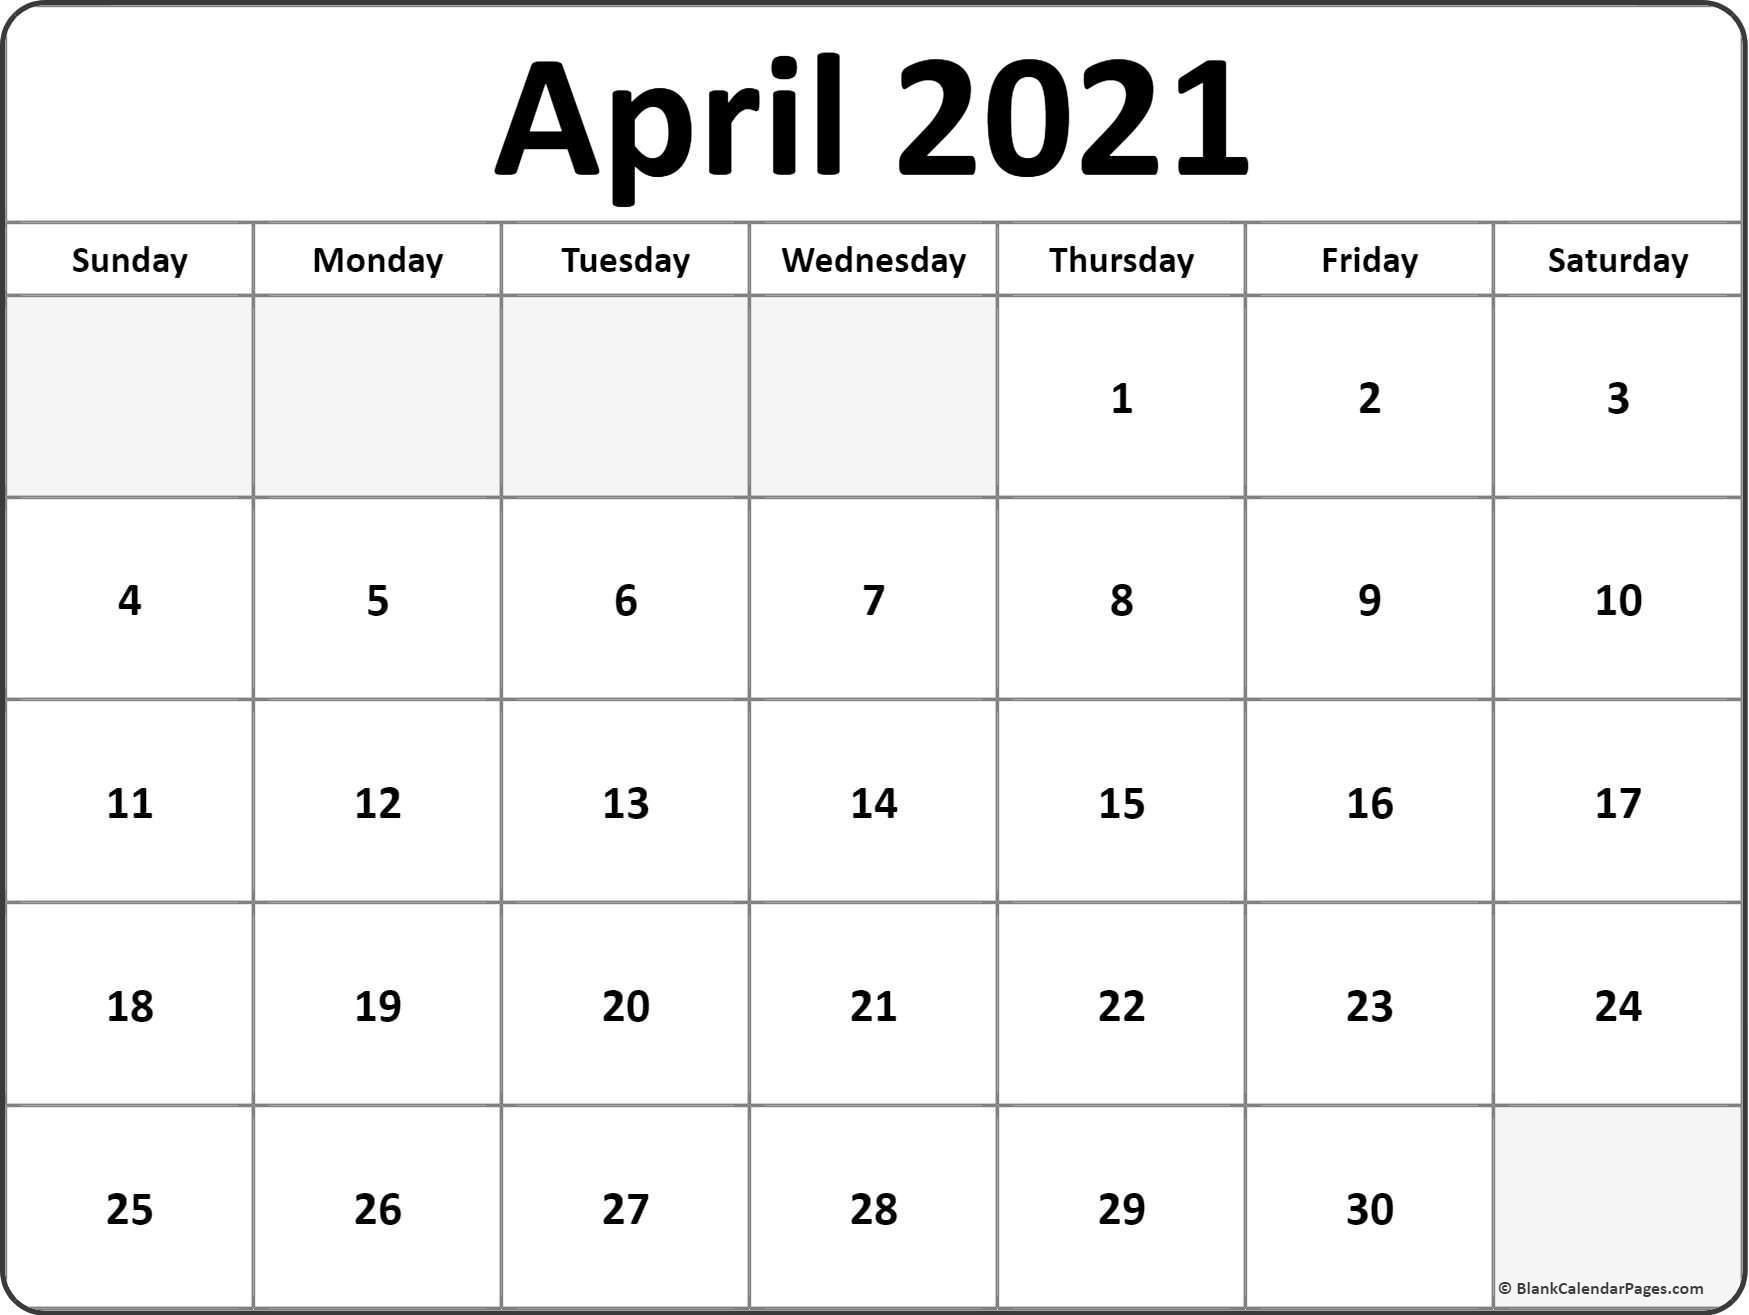 April 2021 Calendar Free Printable Monthly Calendars 3 in Last 3 Month Of 2021 Calendar